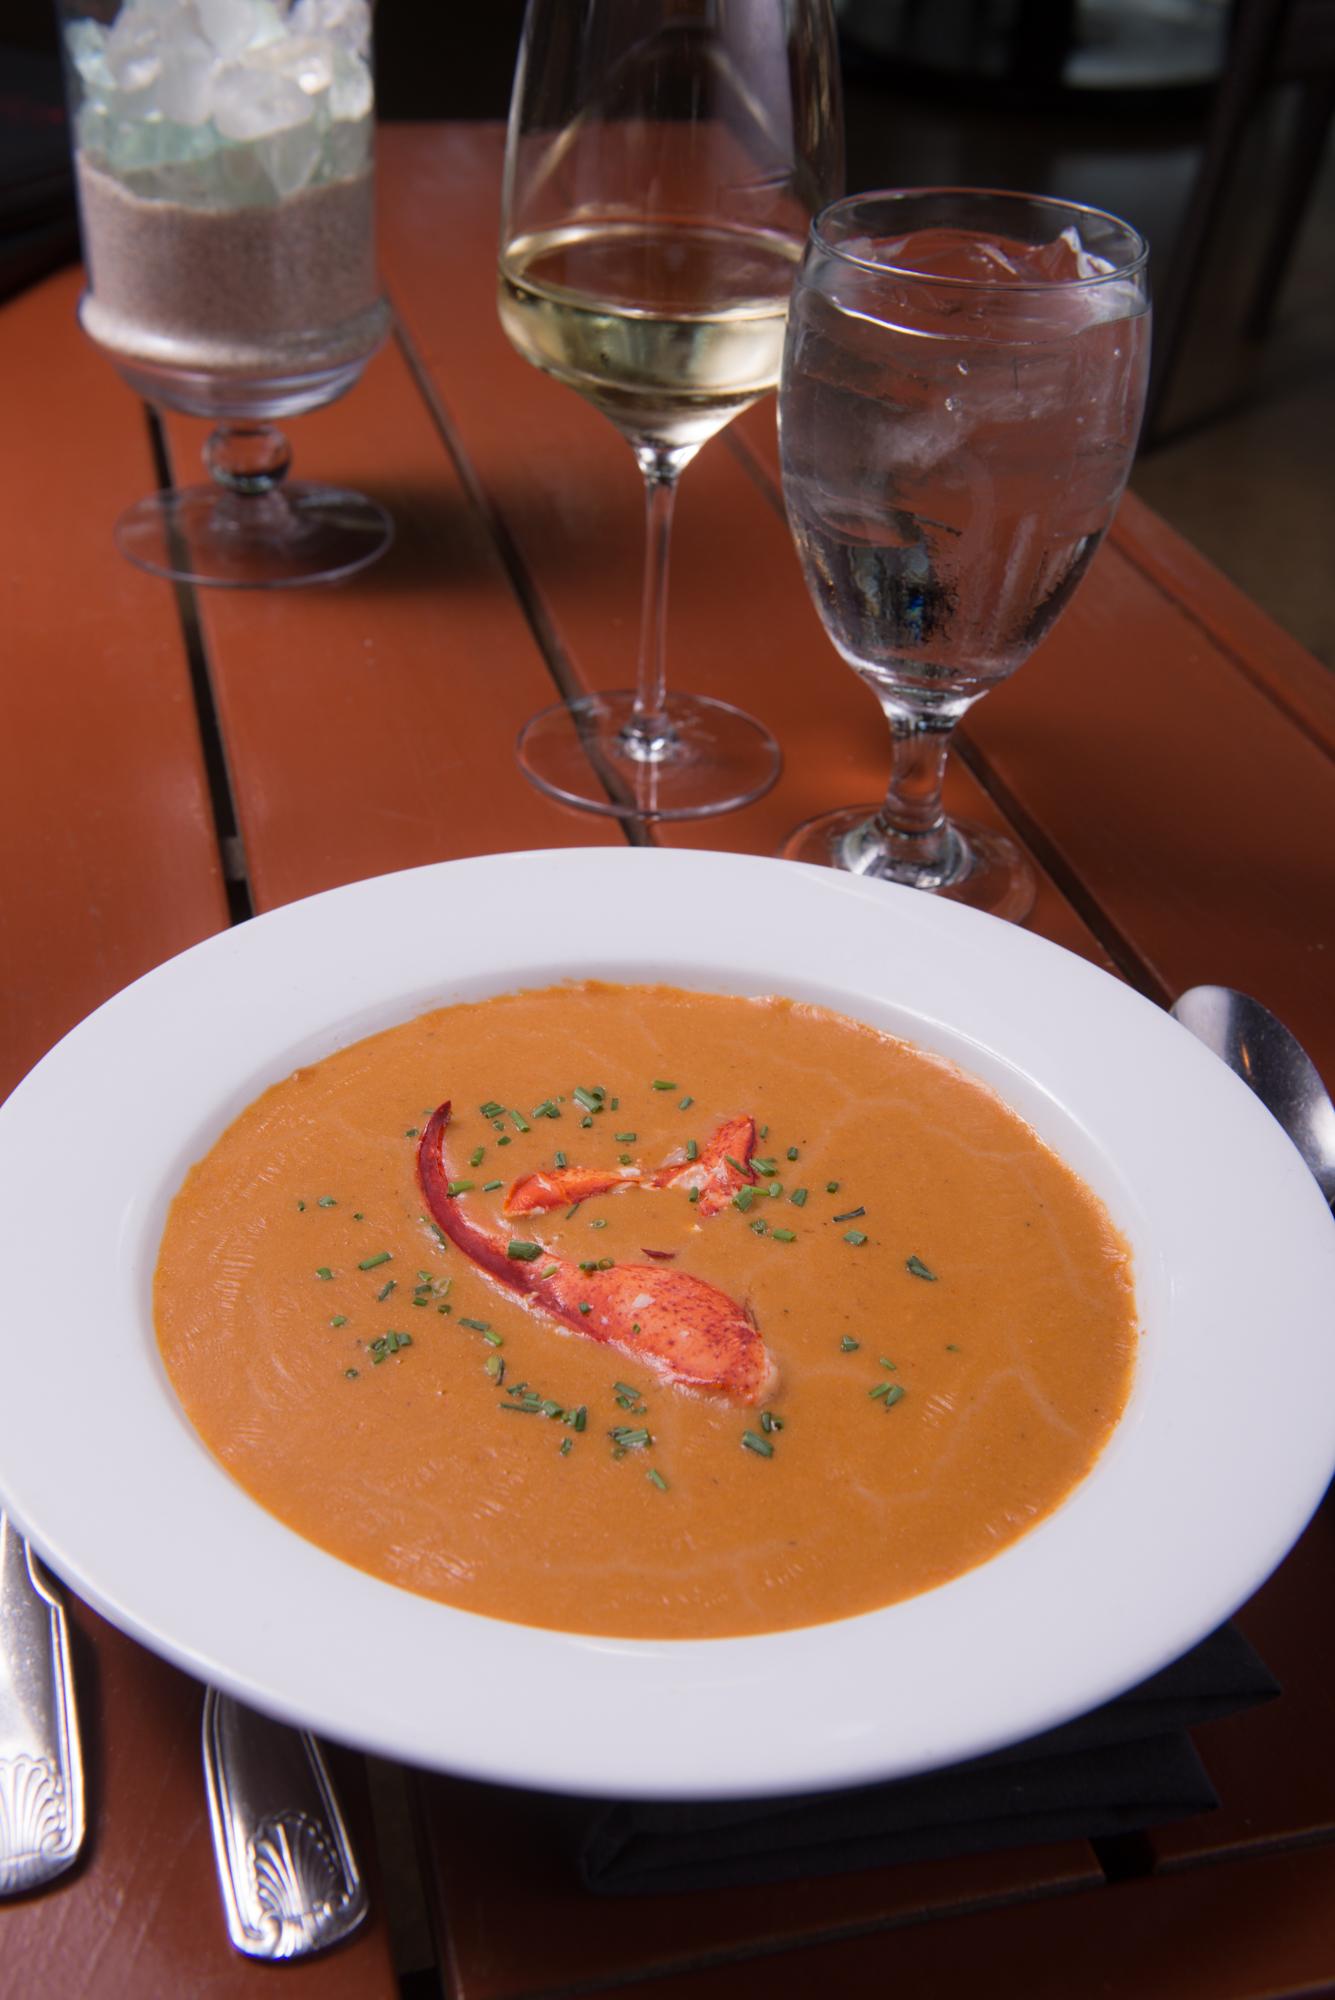 Wildfish s modern interpretation to classic lobster and for Wild fish san antonio